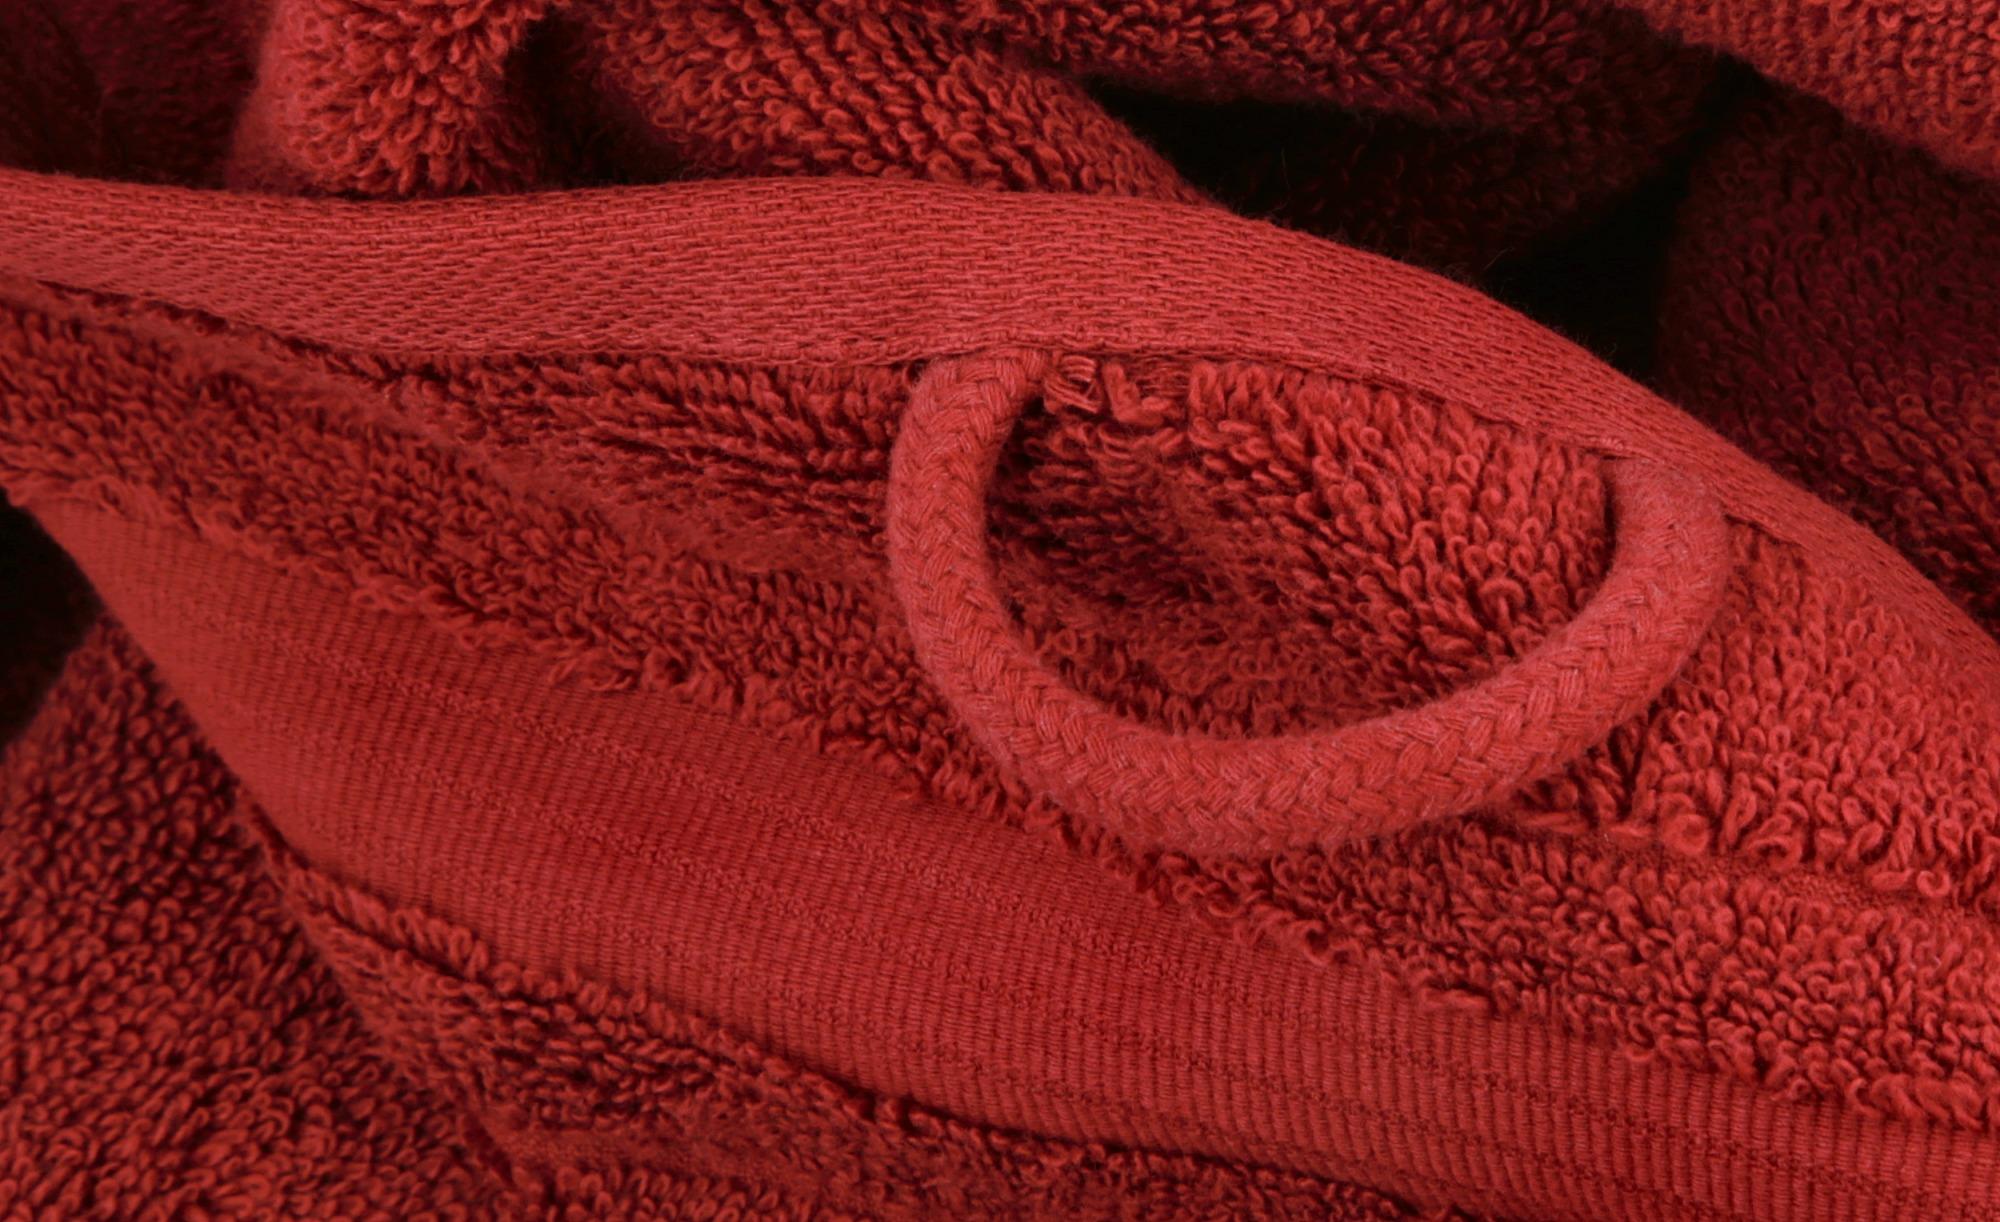 VOSSEN Duschtuch  Soft Dreams ¦ rot ¦ 100% Baumwolle ¦ Maße (cm): B: 67 Badtextilien und Zubehör > Handtücher & Badetücher > Duschtücher - Höffner